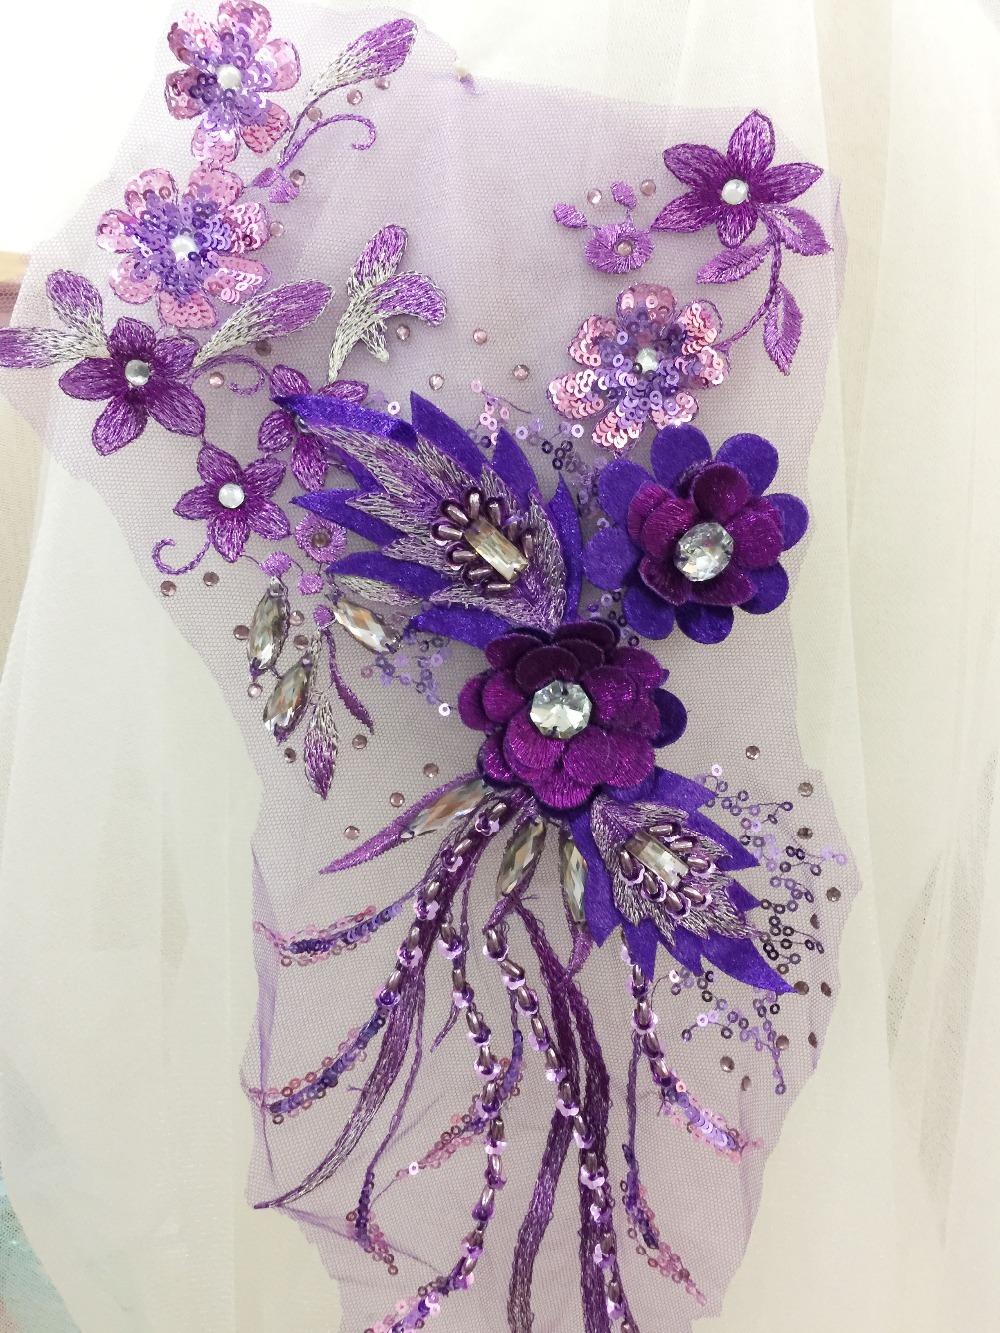 2 pcs 3D Rhinestone Beaded Flower Lace Applique in Royal blue  0b93d9bb7d7a